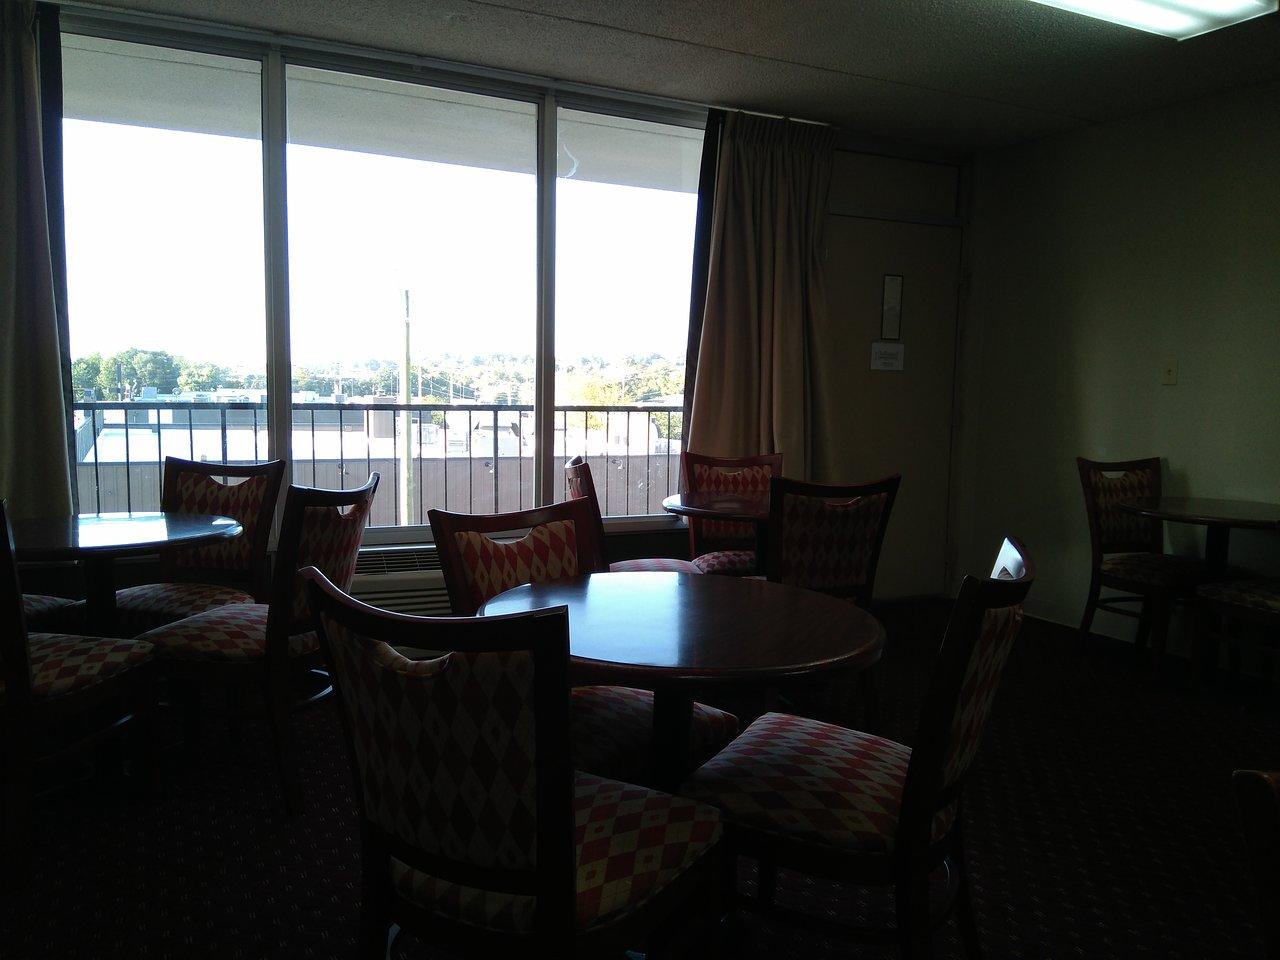 fiddler s inn north 79 8 9 updated 2019 prices hotel rh tripadvisor com